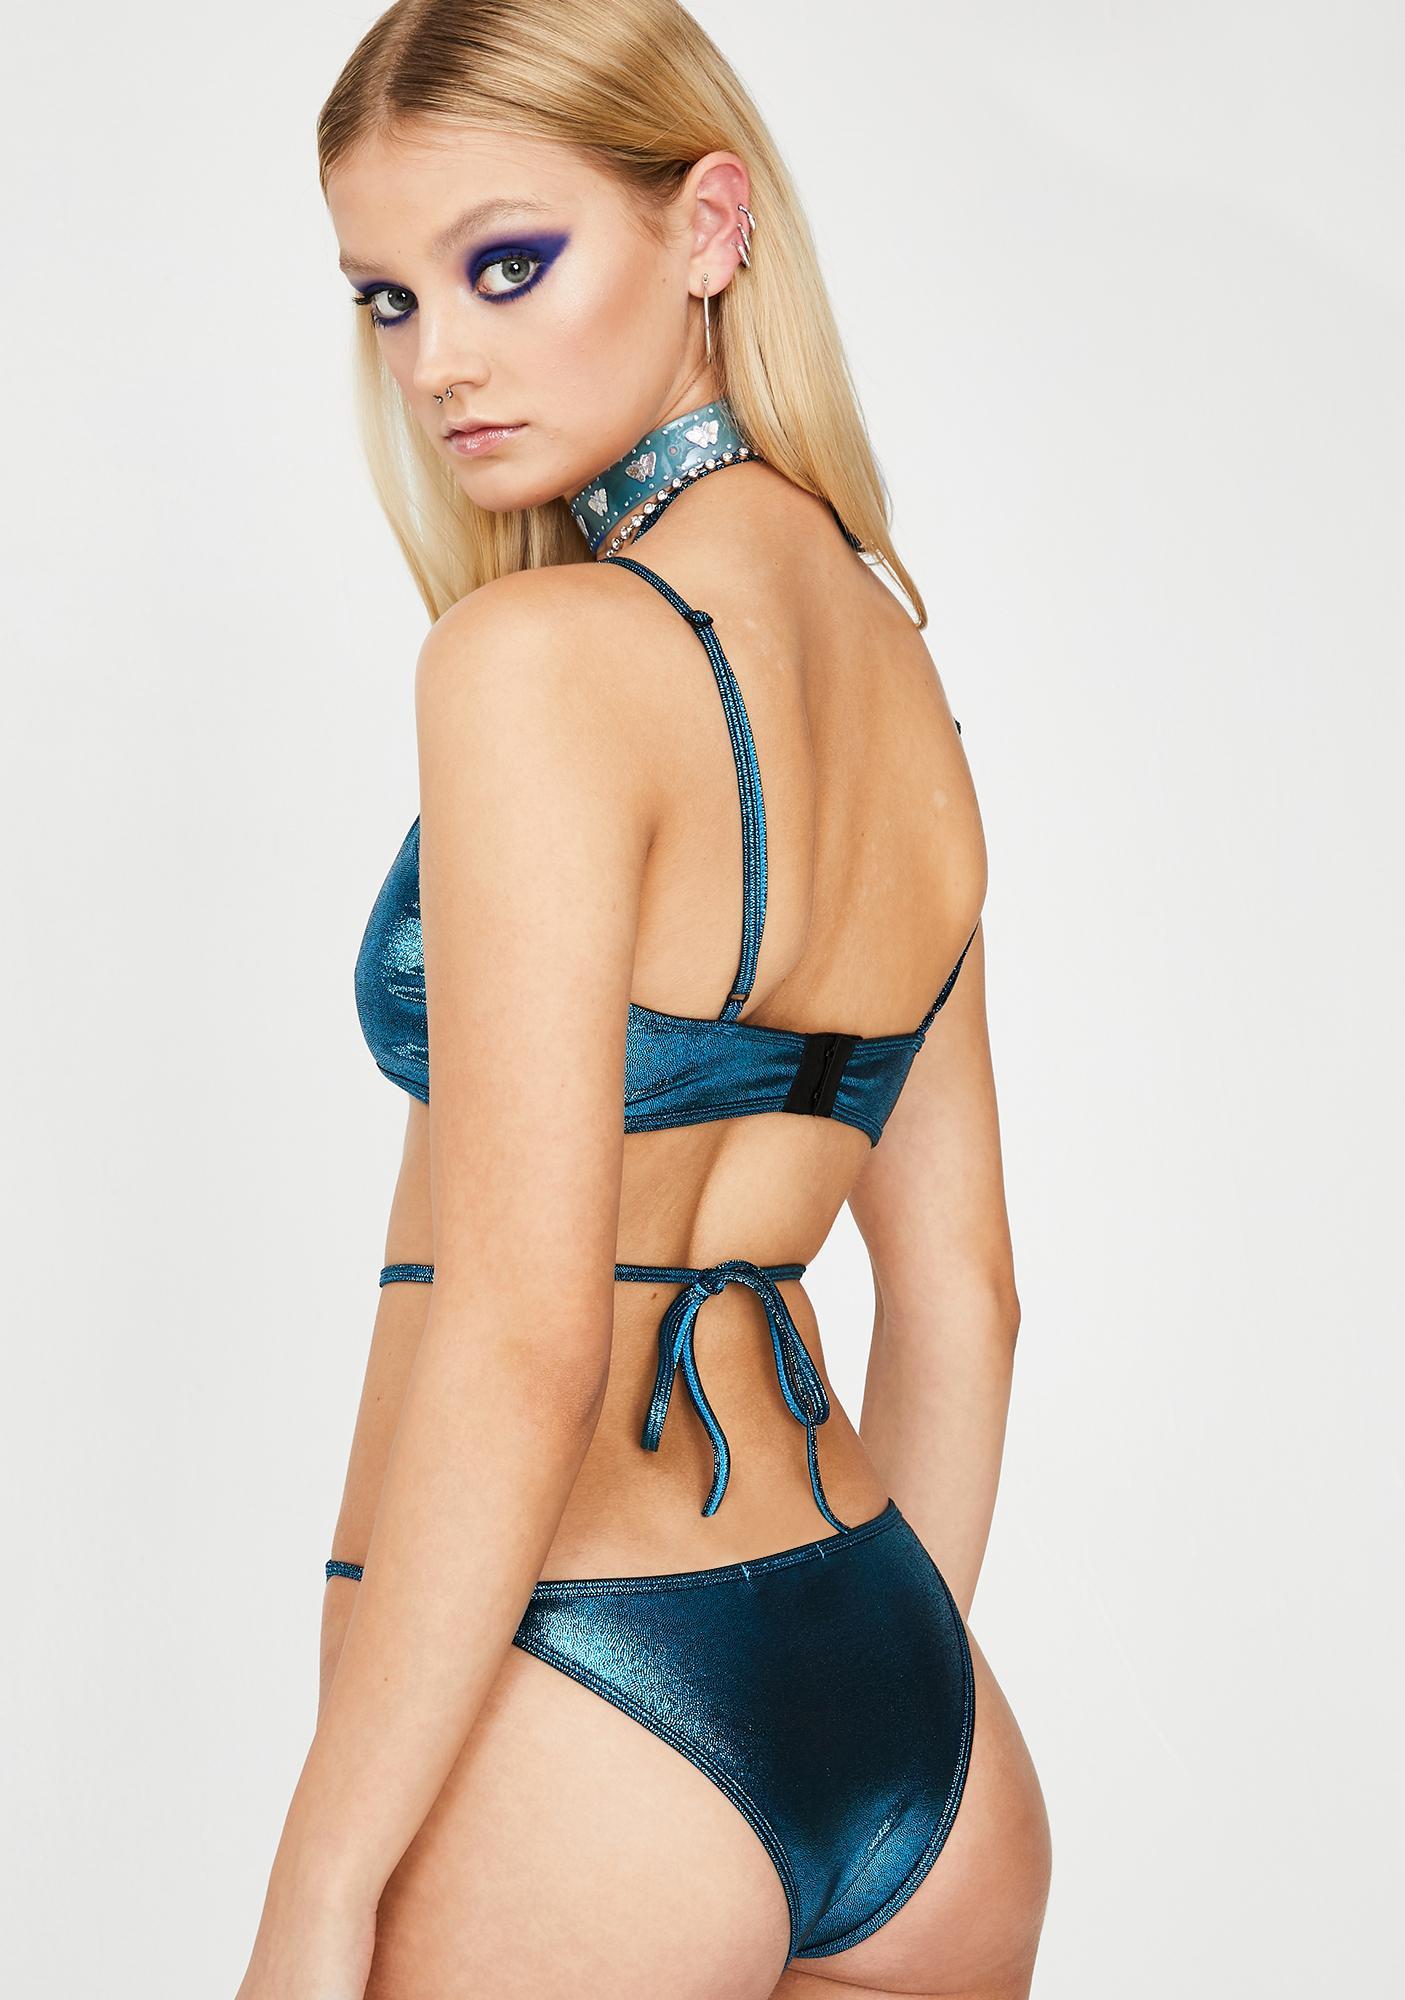 Club Exx Sensory Surge Cutout Bodysuit